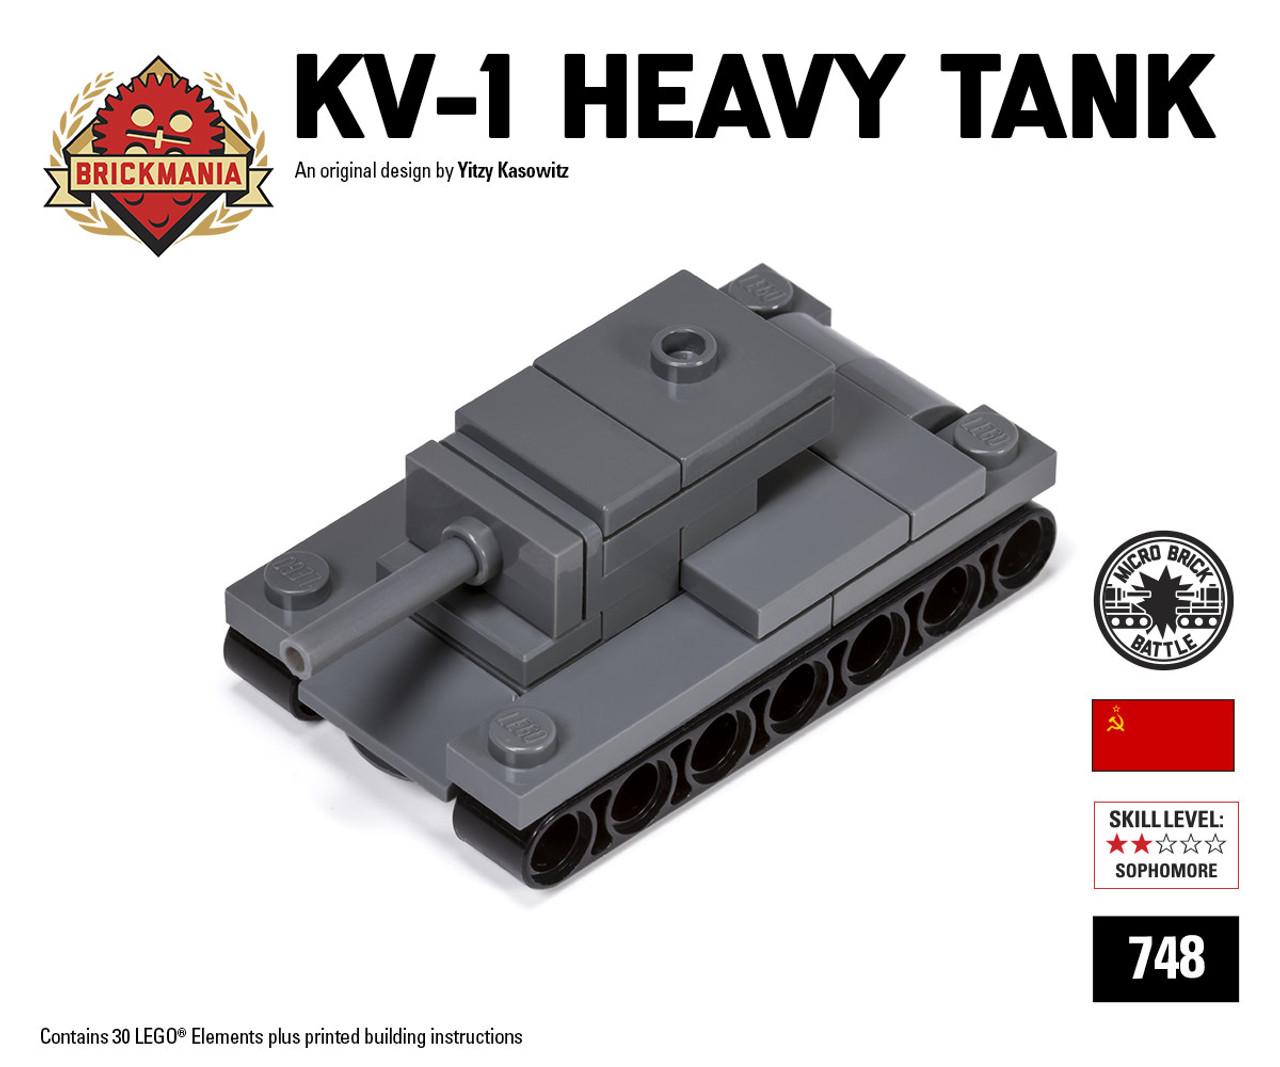 Micro Brick Battle - KV-1